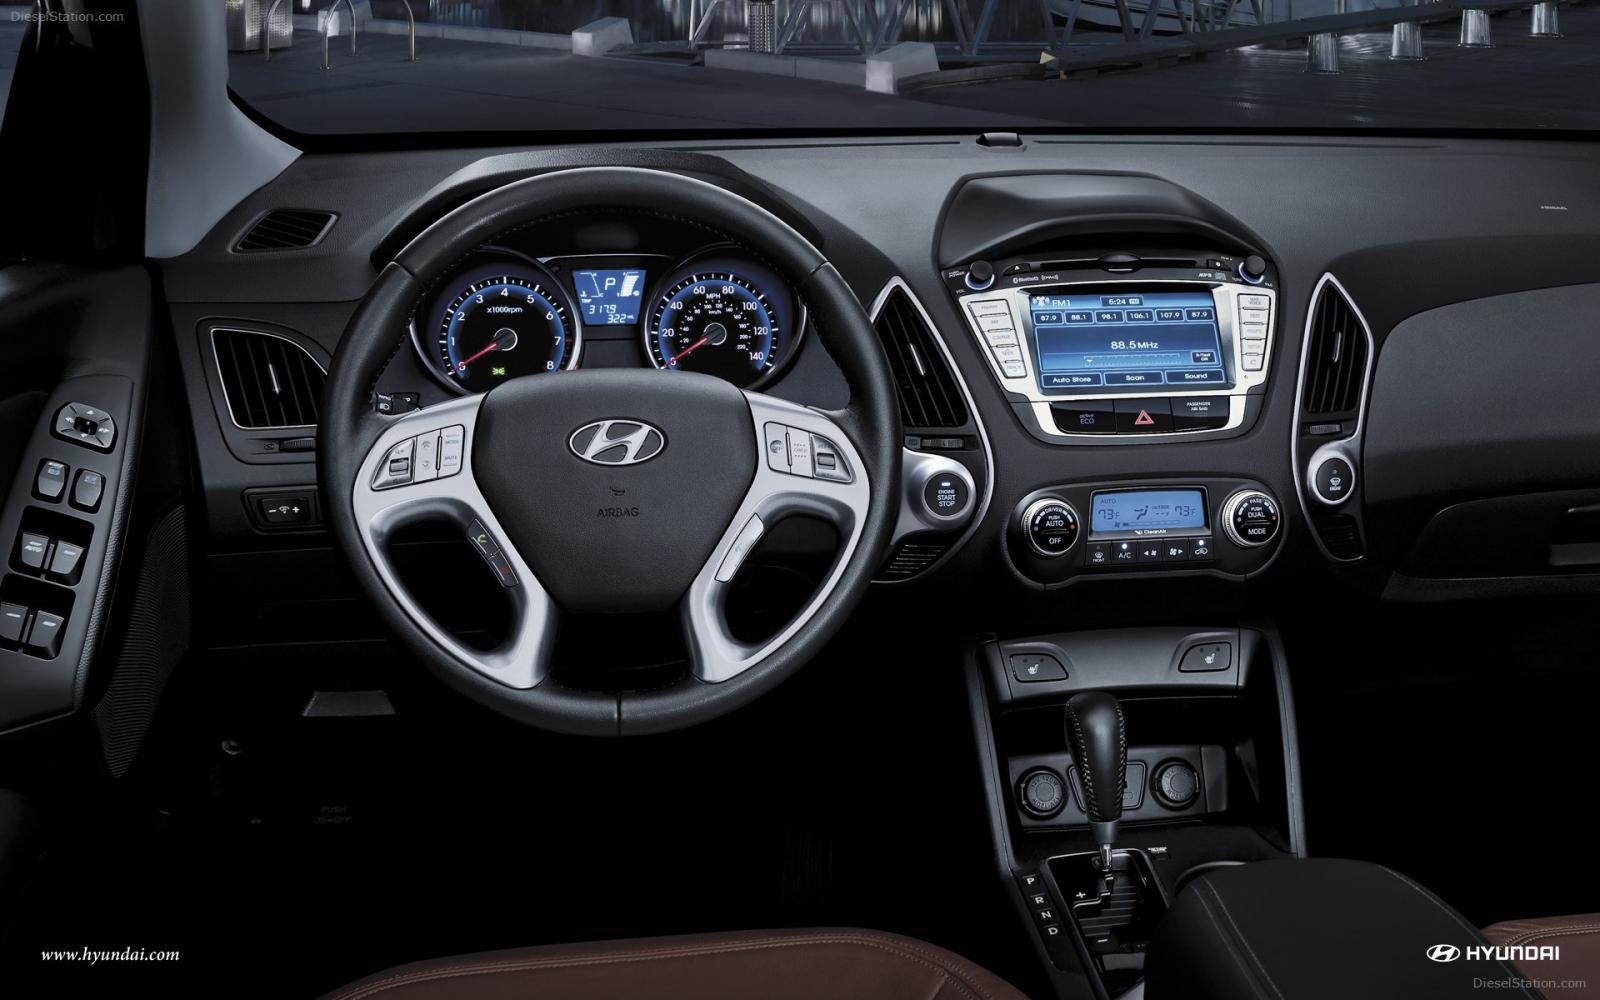 2013 Hyundai Tucson - Information and photos - Zomb Drive